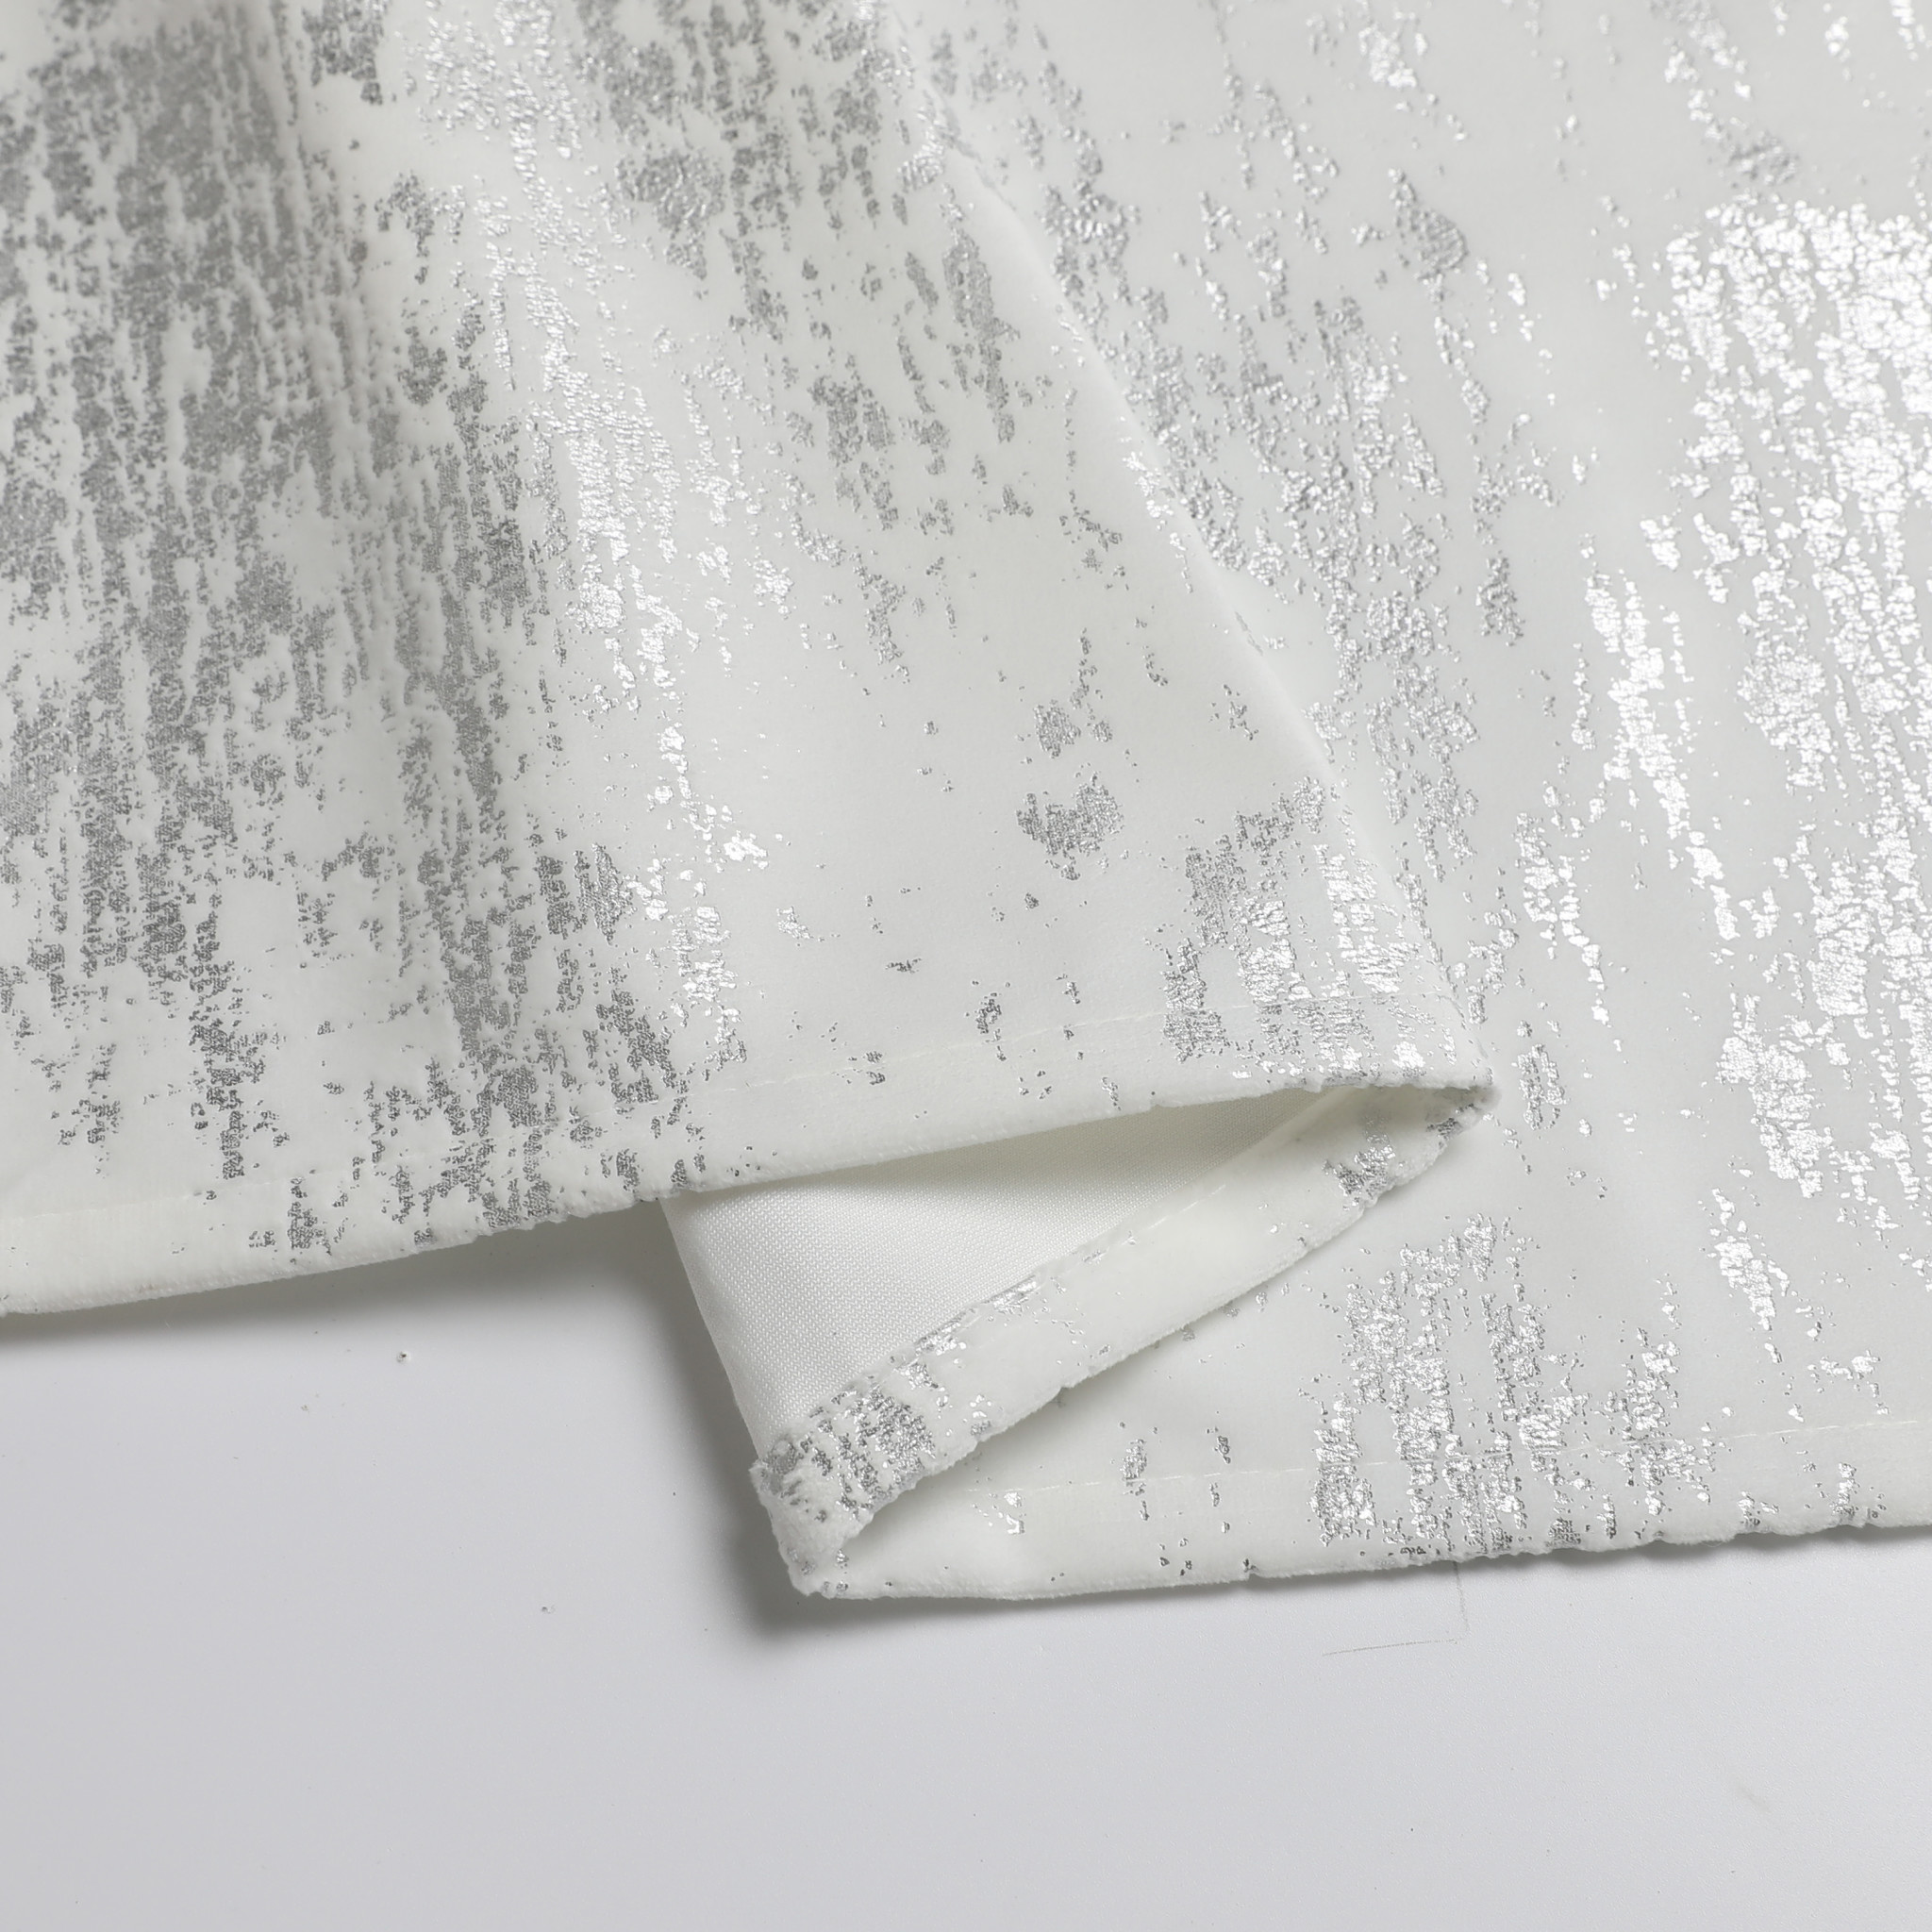 TC1403- Mosaic White Silver Print 70 x 160 Tablecloth